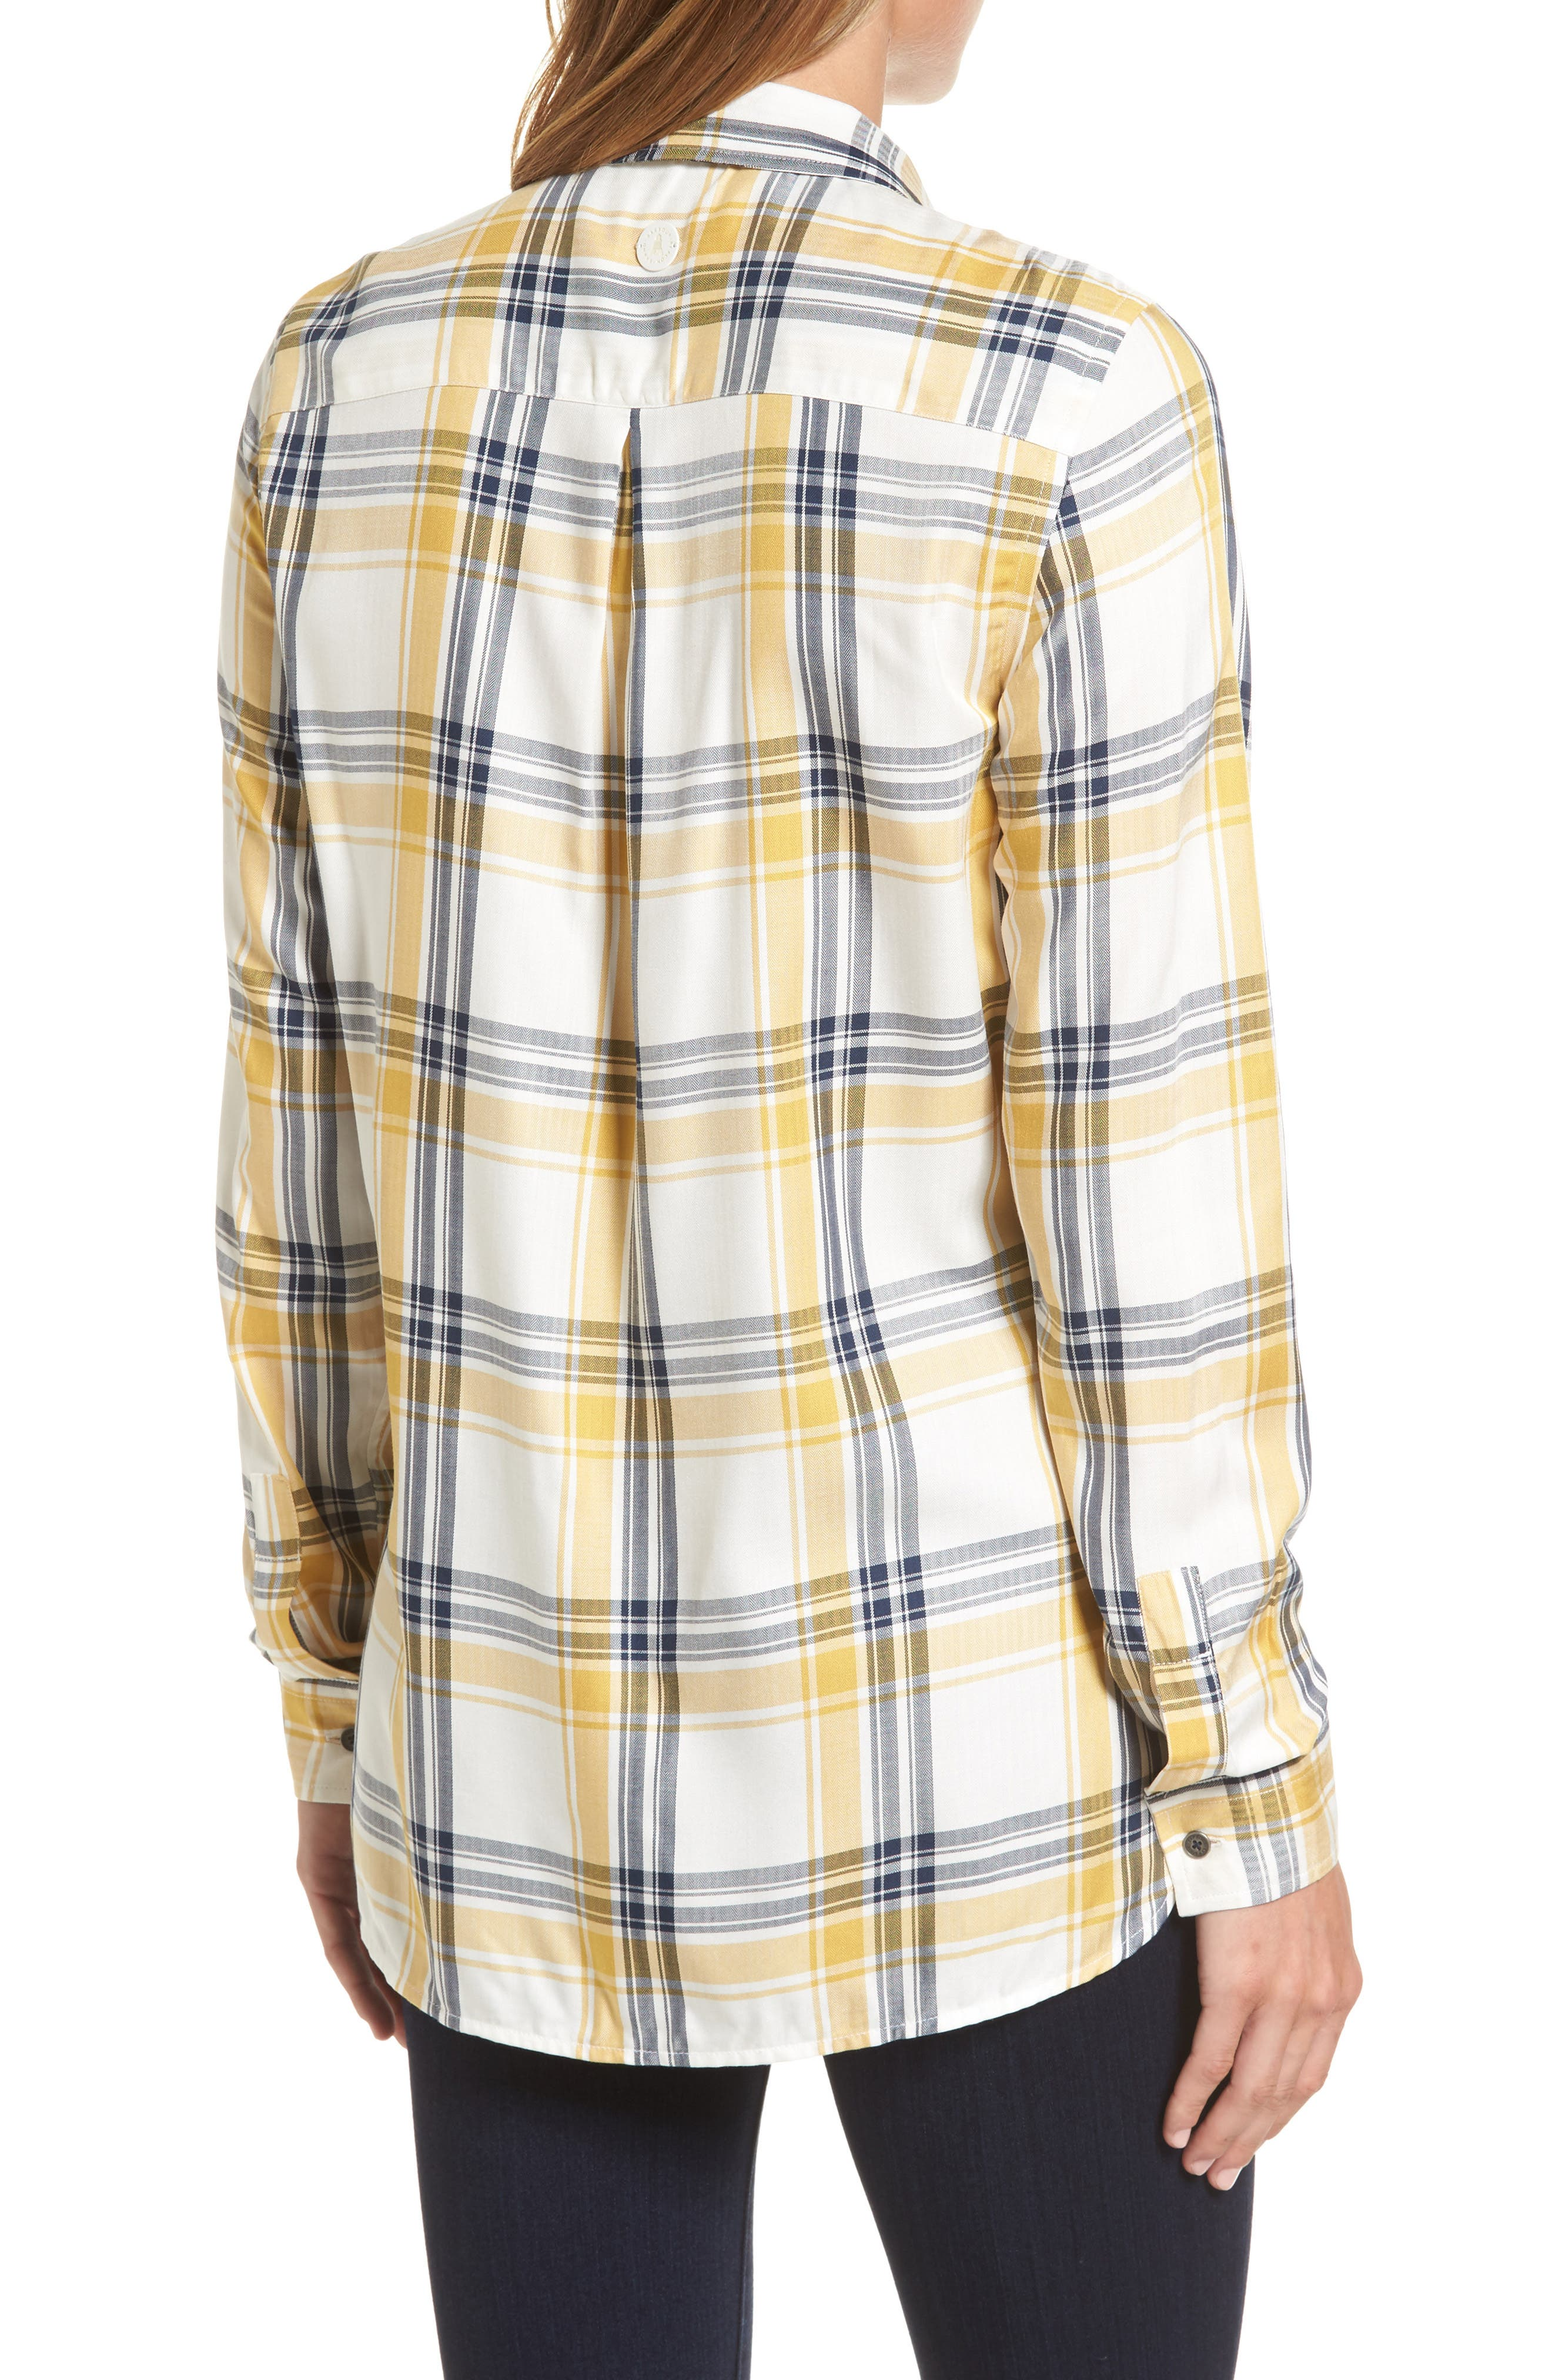 Newton Plaid Shirt,                             Alternate thumbnail 2, color,                             Sun Gold